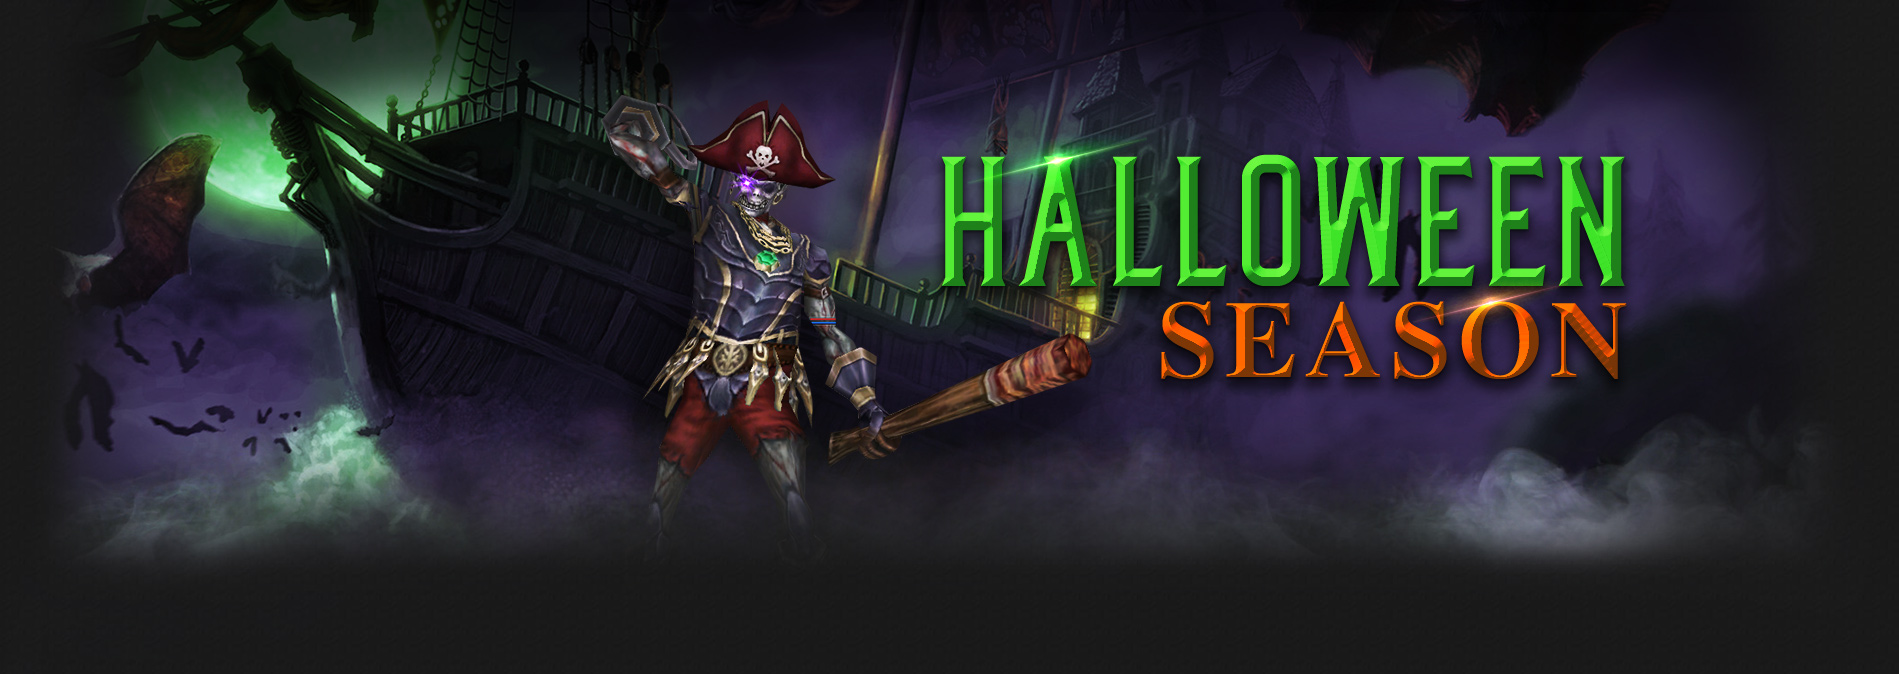 Halloween Season!